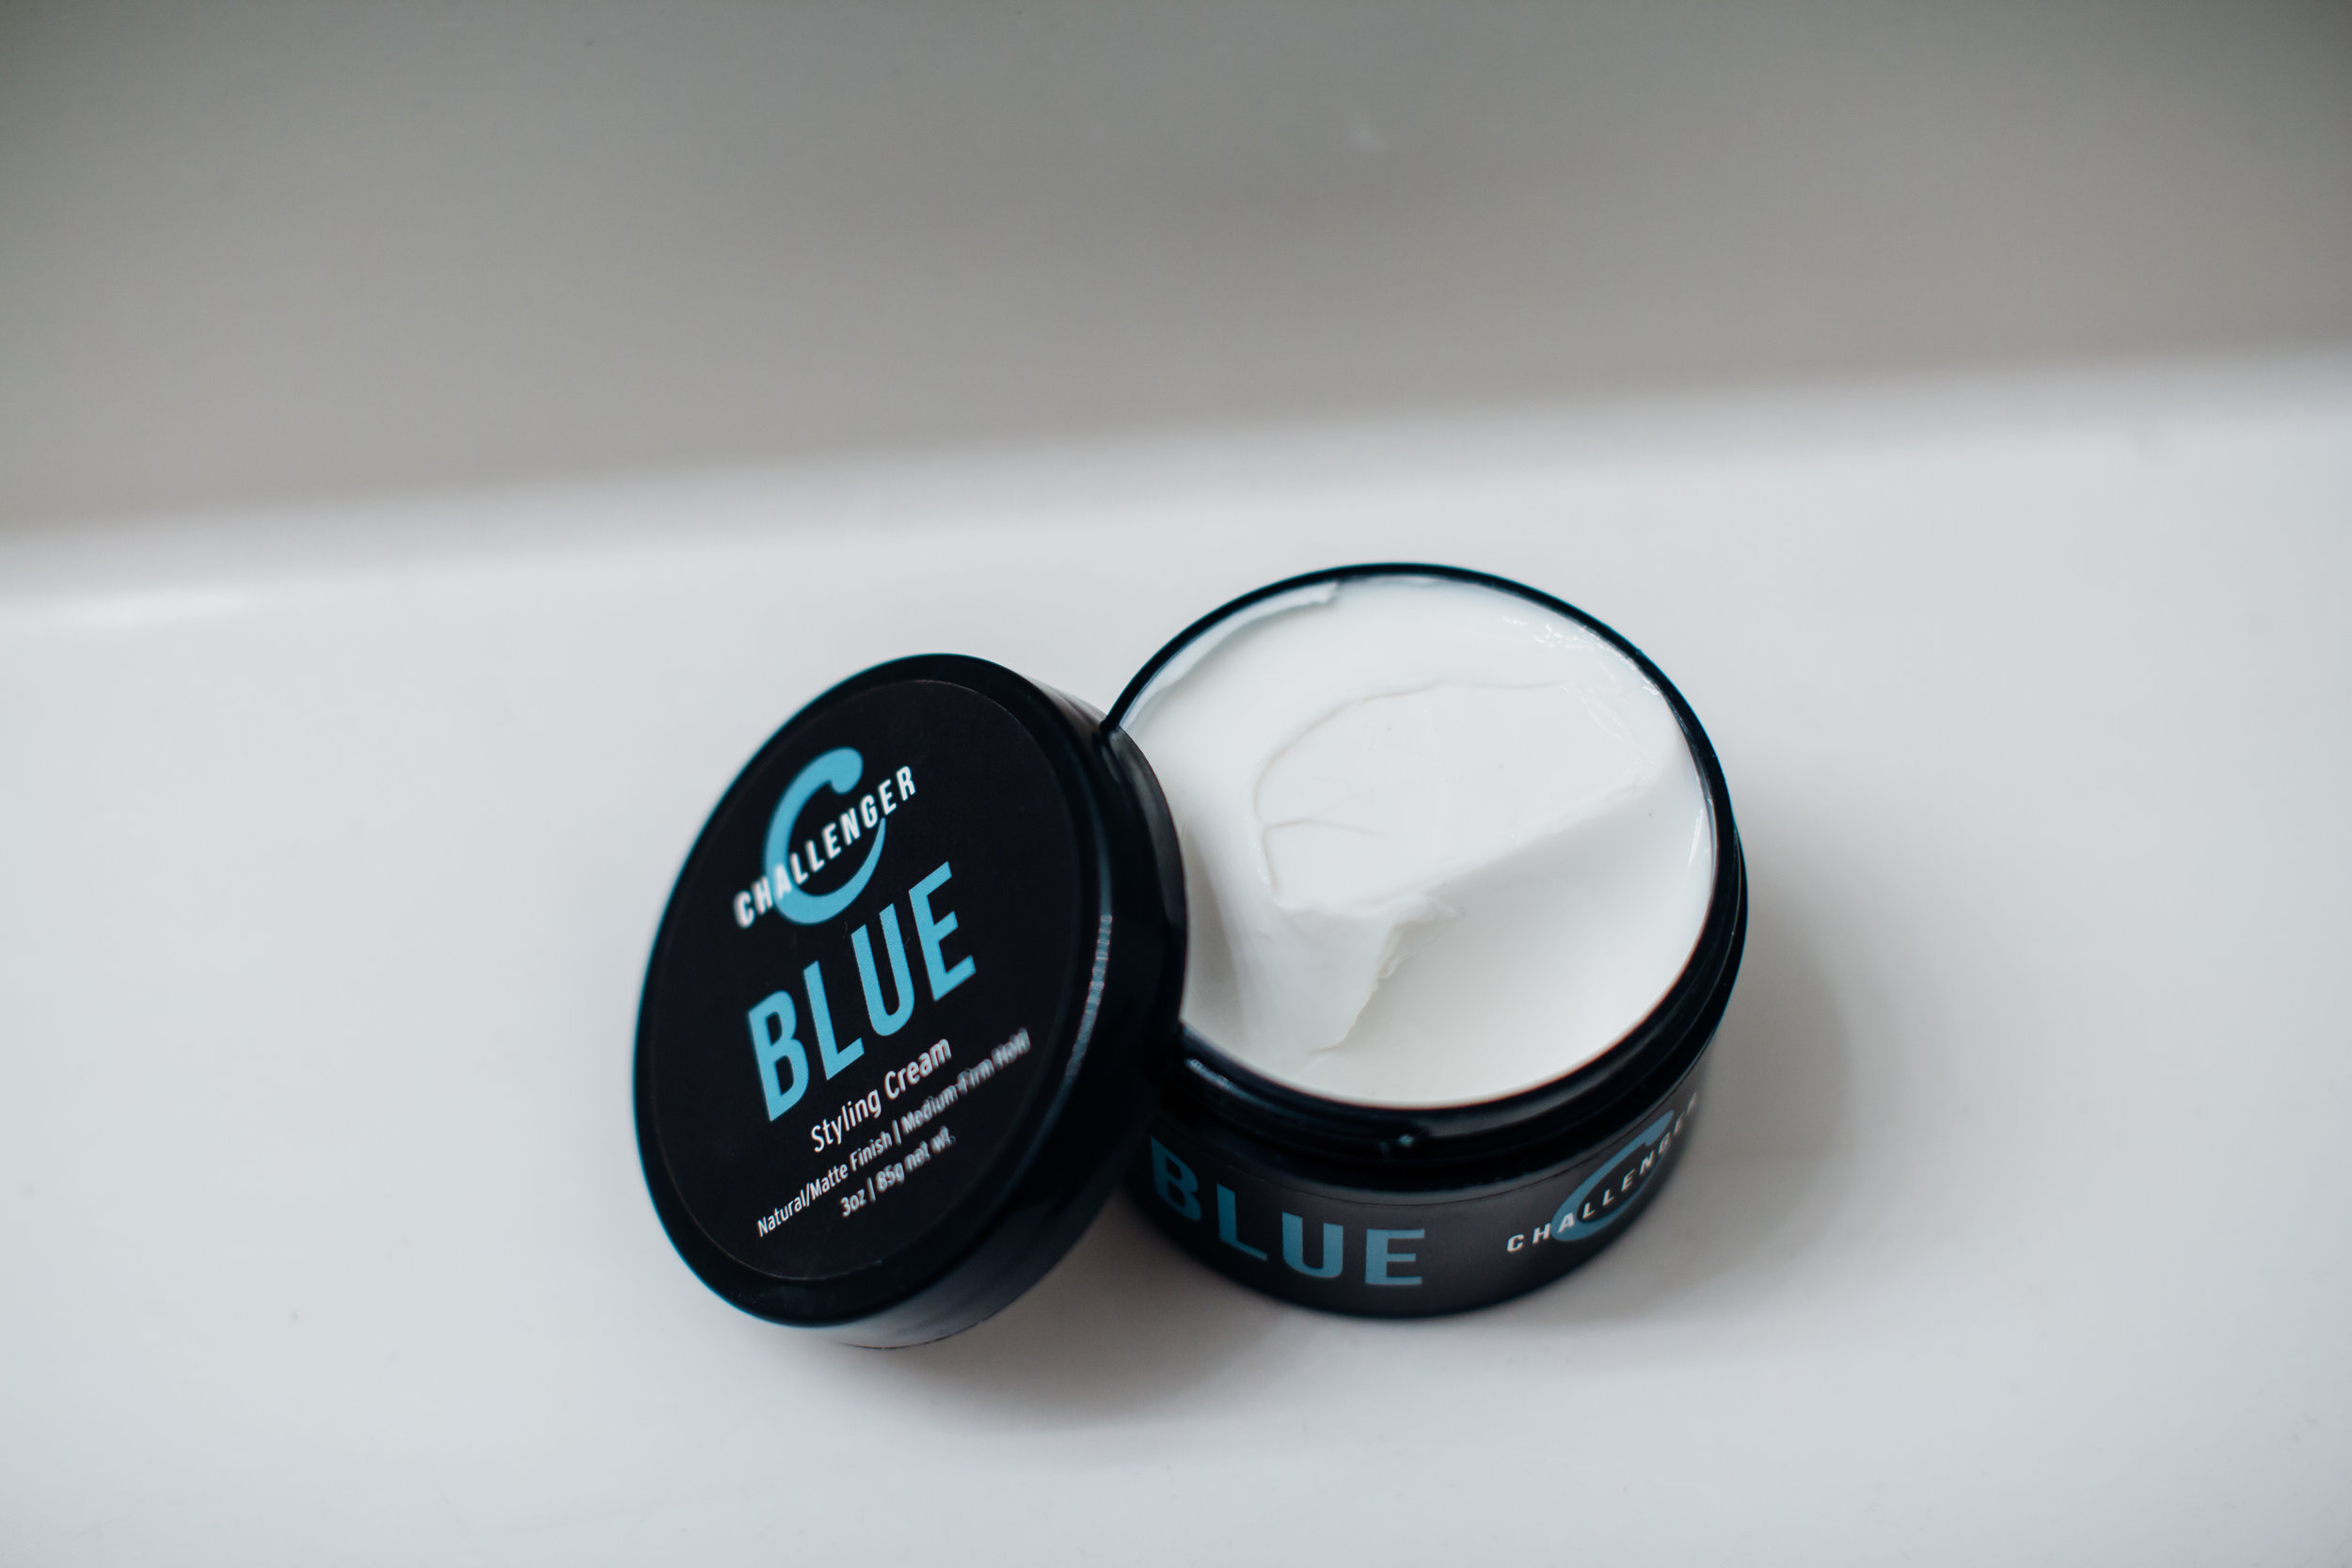 Challenger Blue Matte Styling Cream